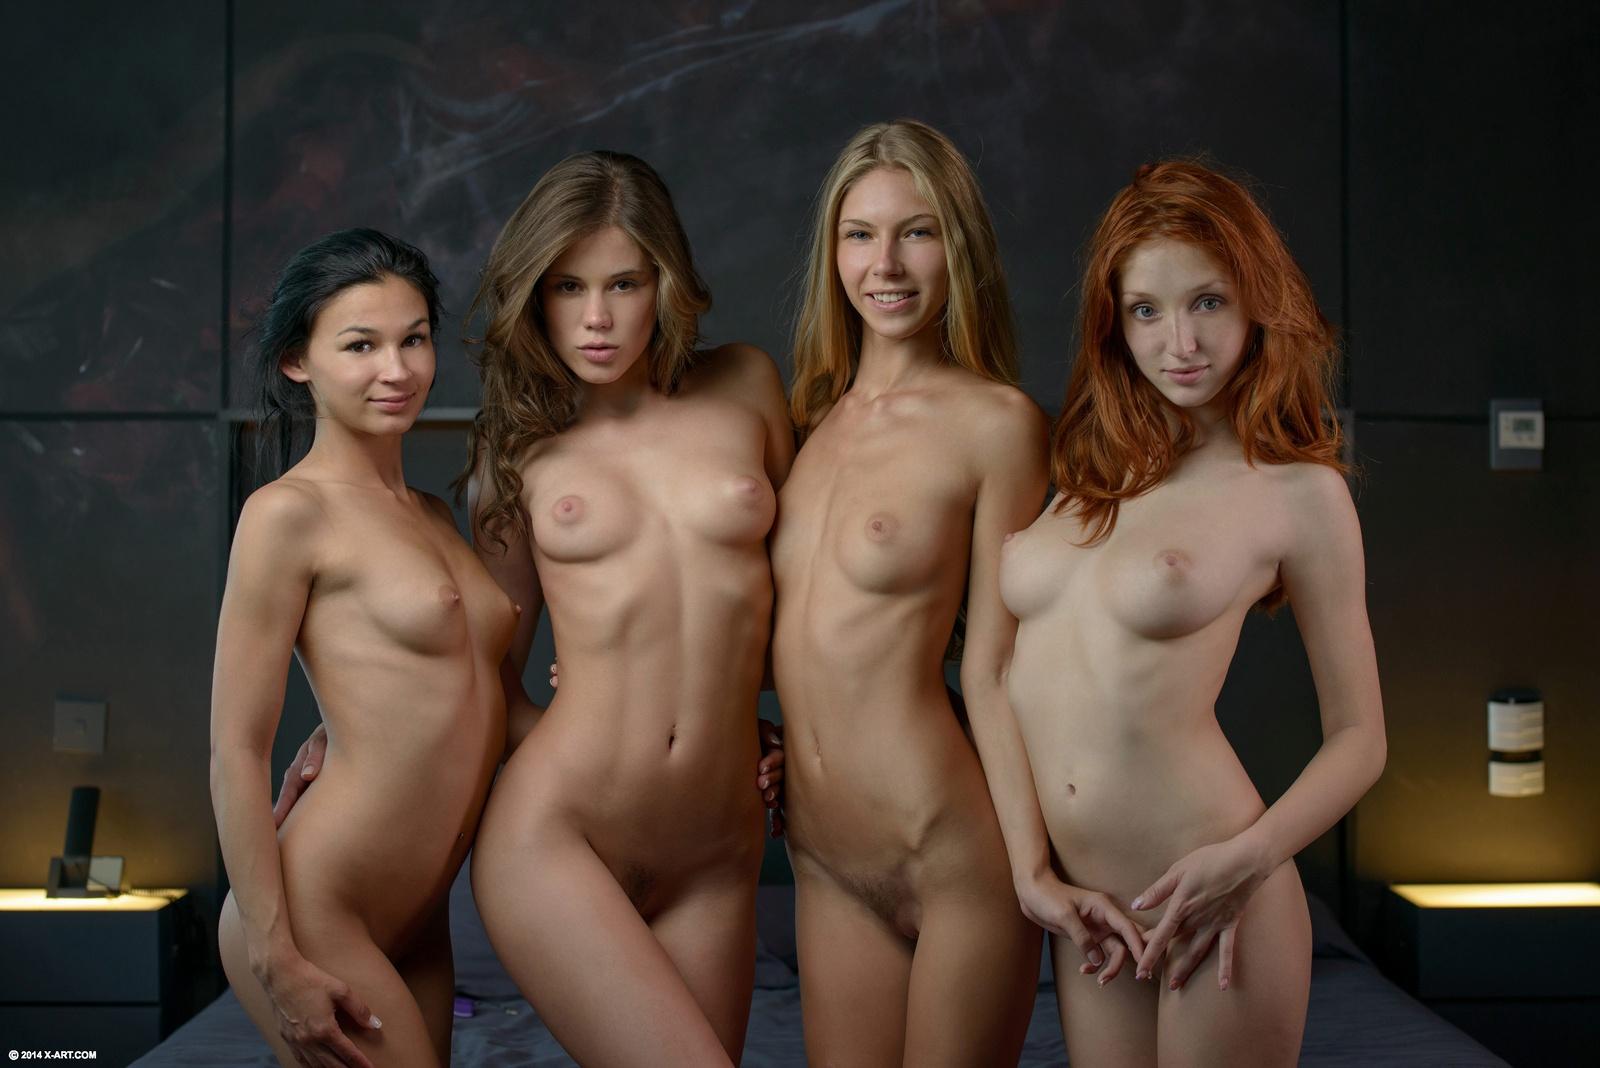 katia winter nude